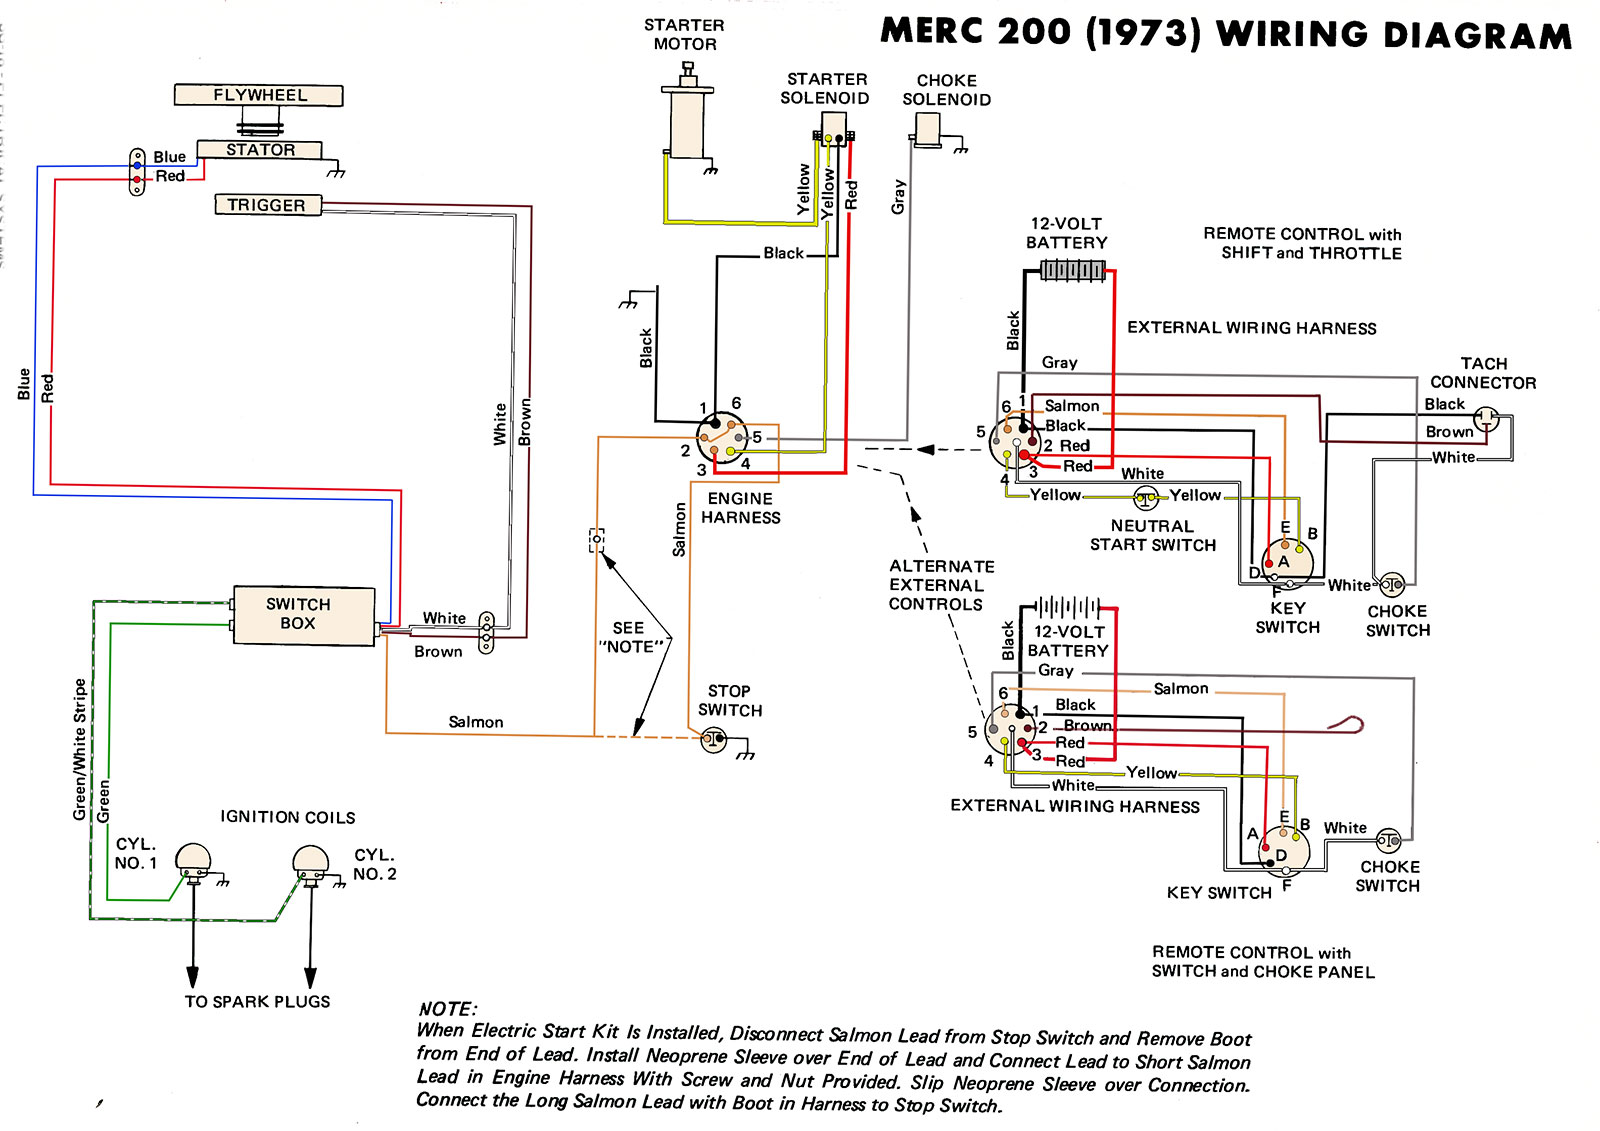 125 Hp Mercury Outboard Wiring Diagram Harness Mercathode System On Marine Tachometer